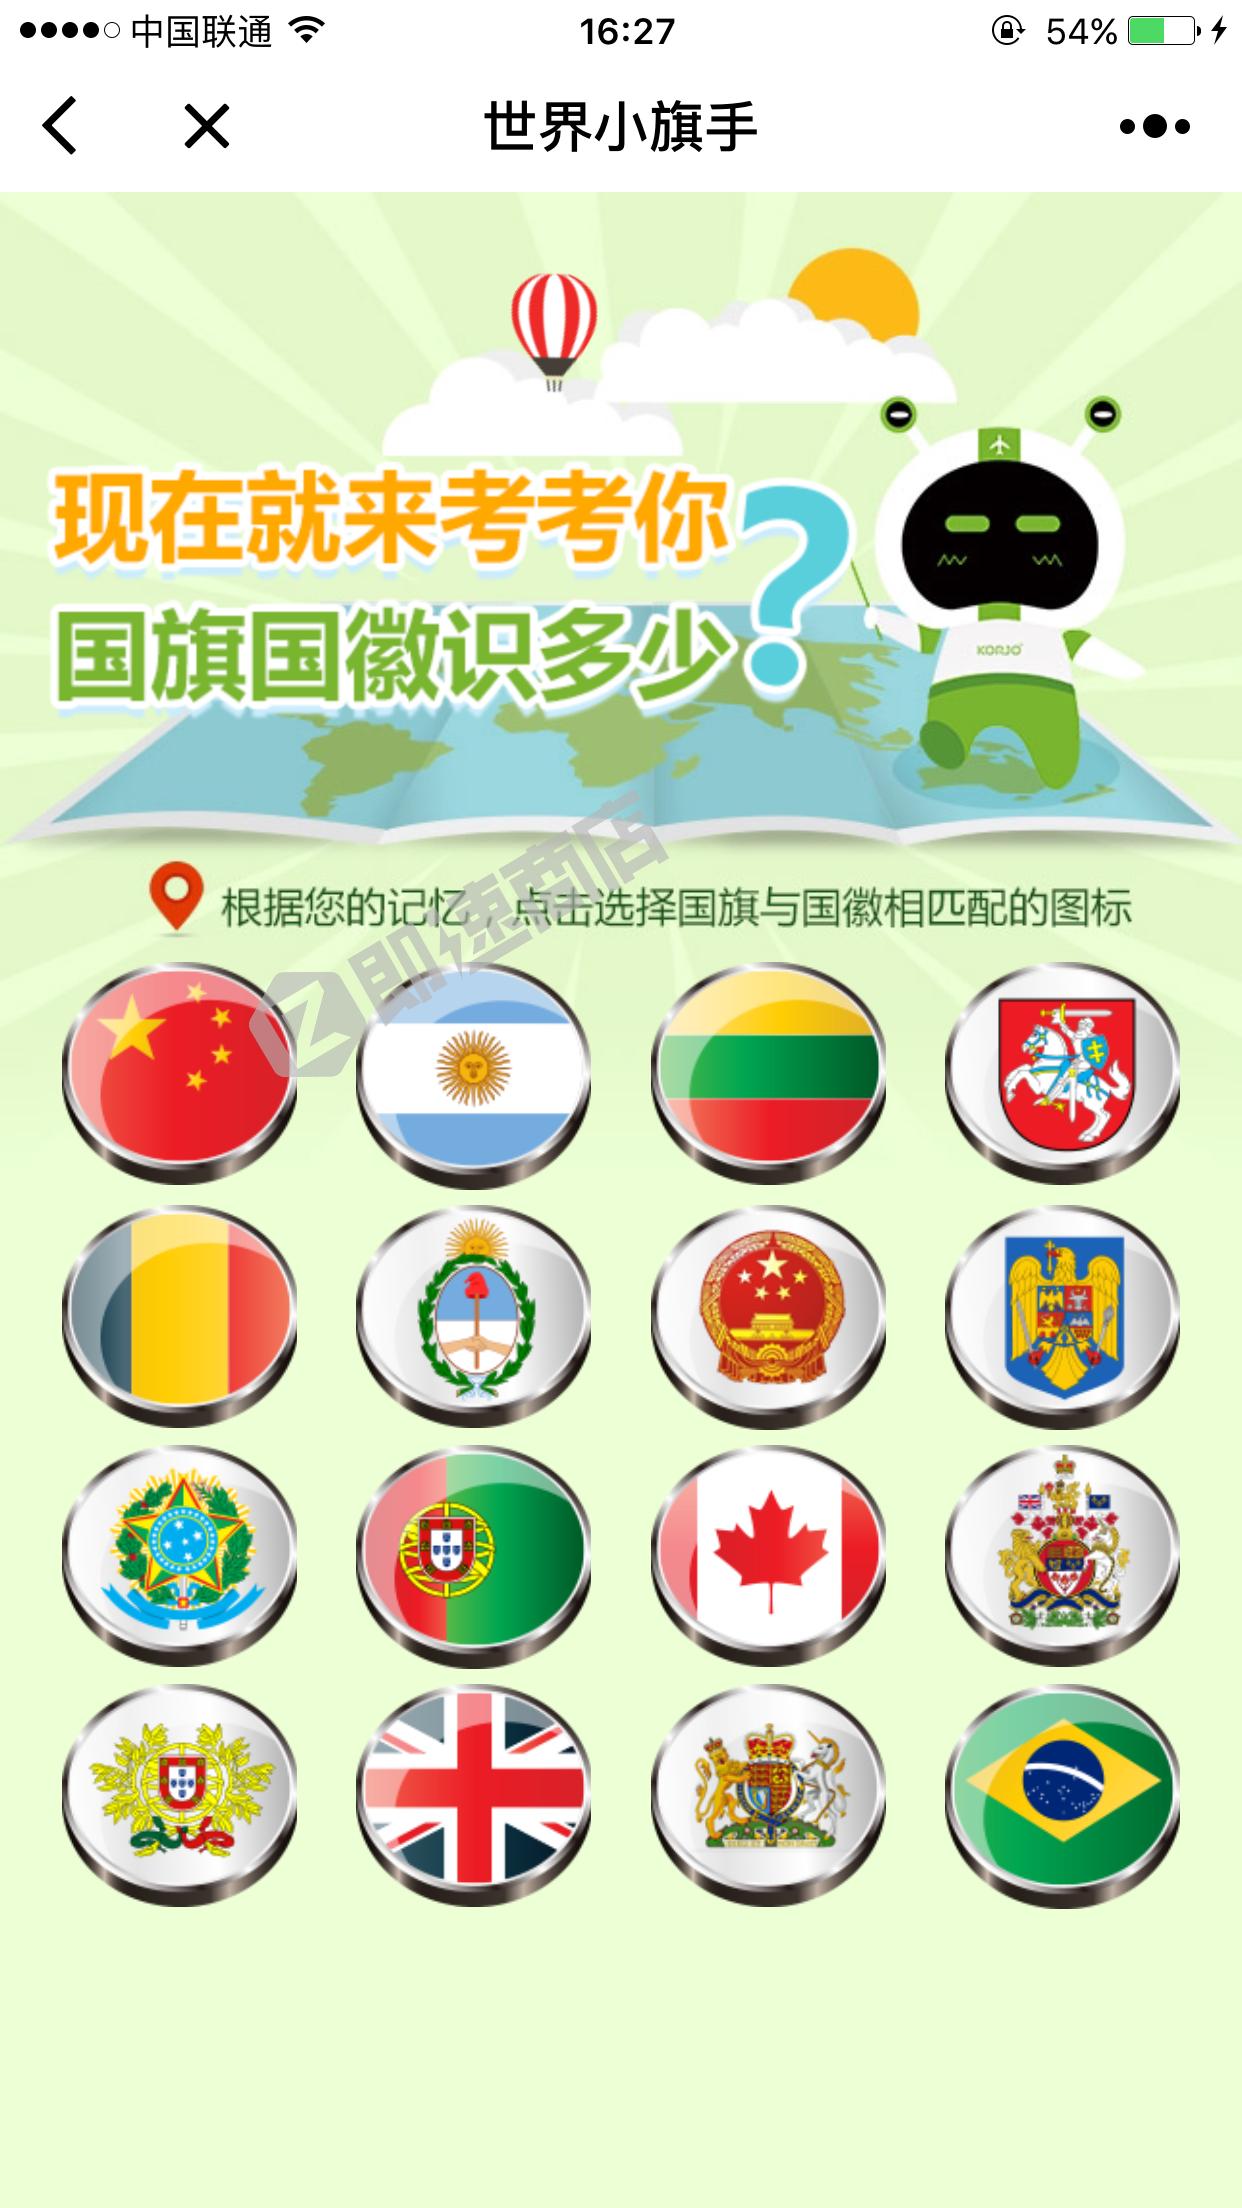 KORJO世界小旗手小程序列表页截图